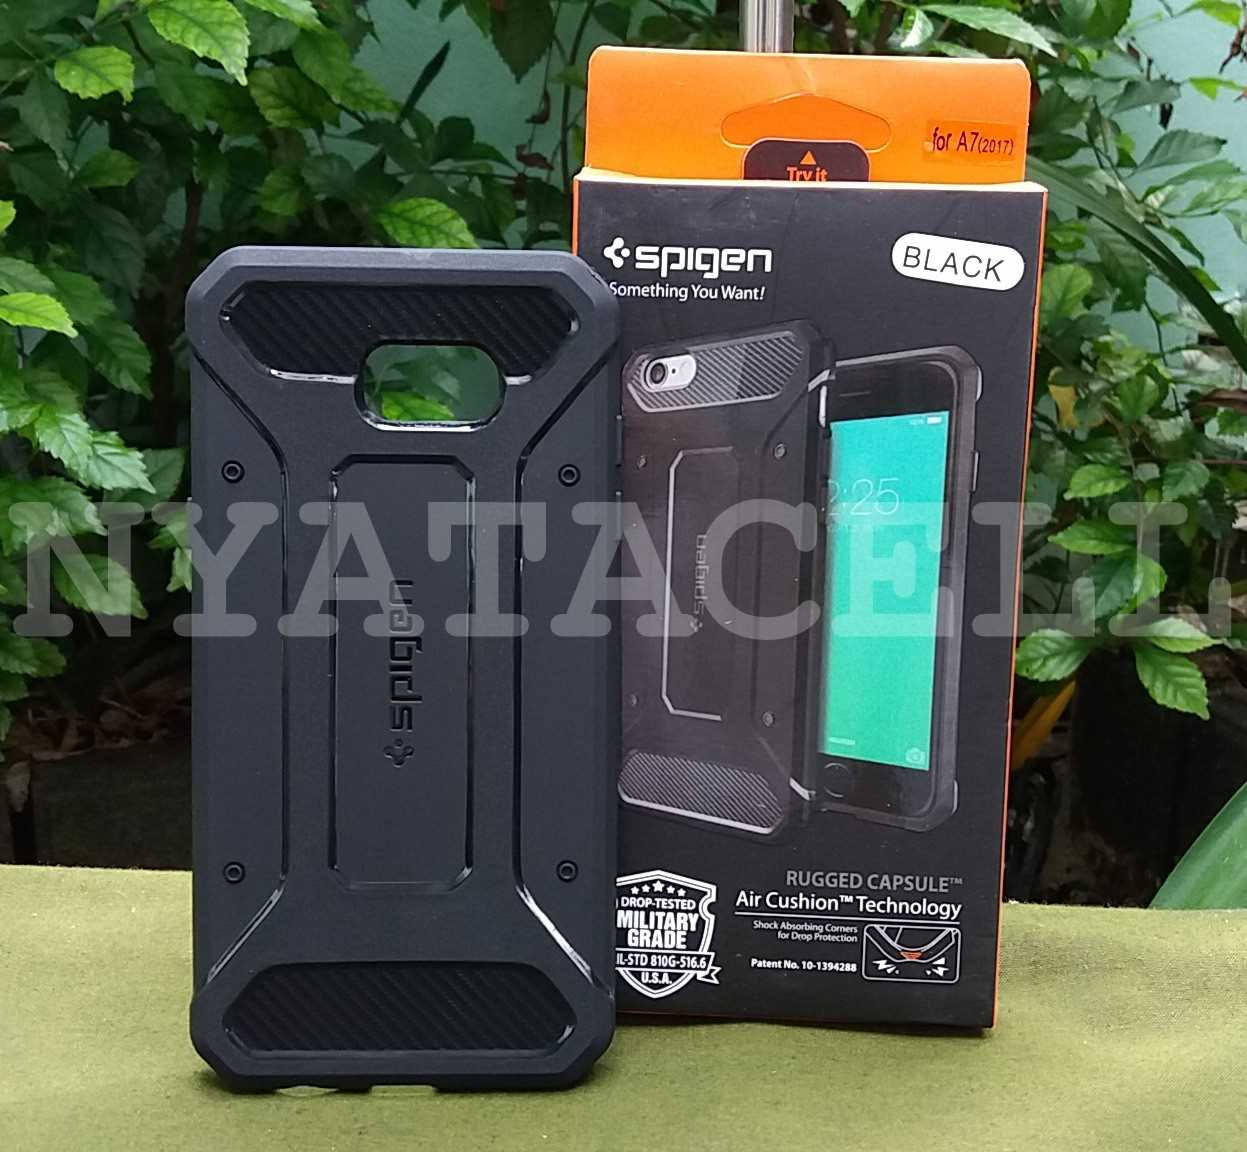 Jual Spigen Capsule Samsung A7 2017 A720 Soft/Case/Rugged Armor/Carbon - Hitam - nyatacell | Tokopedia